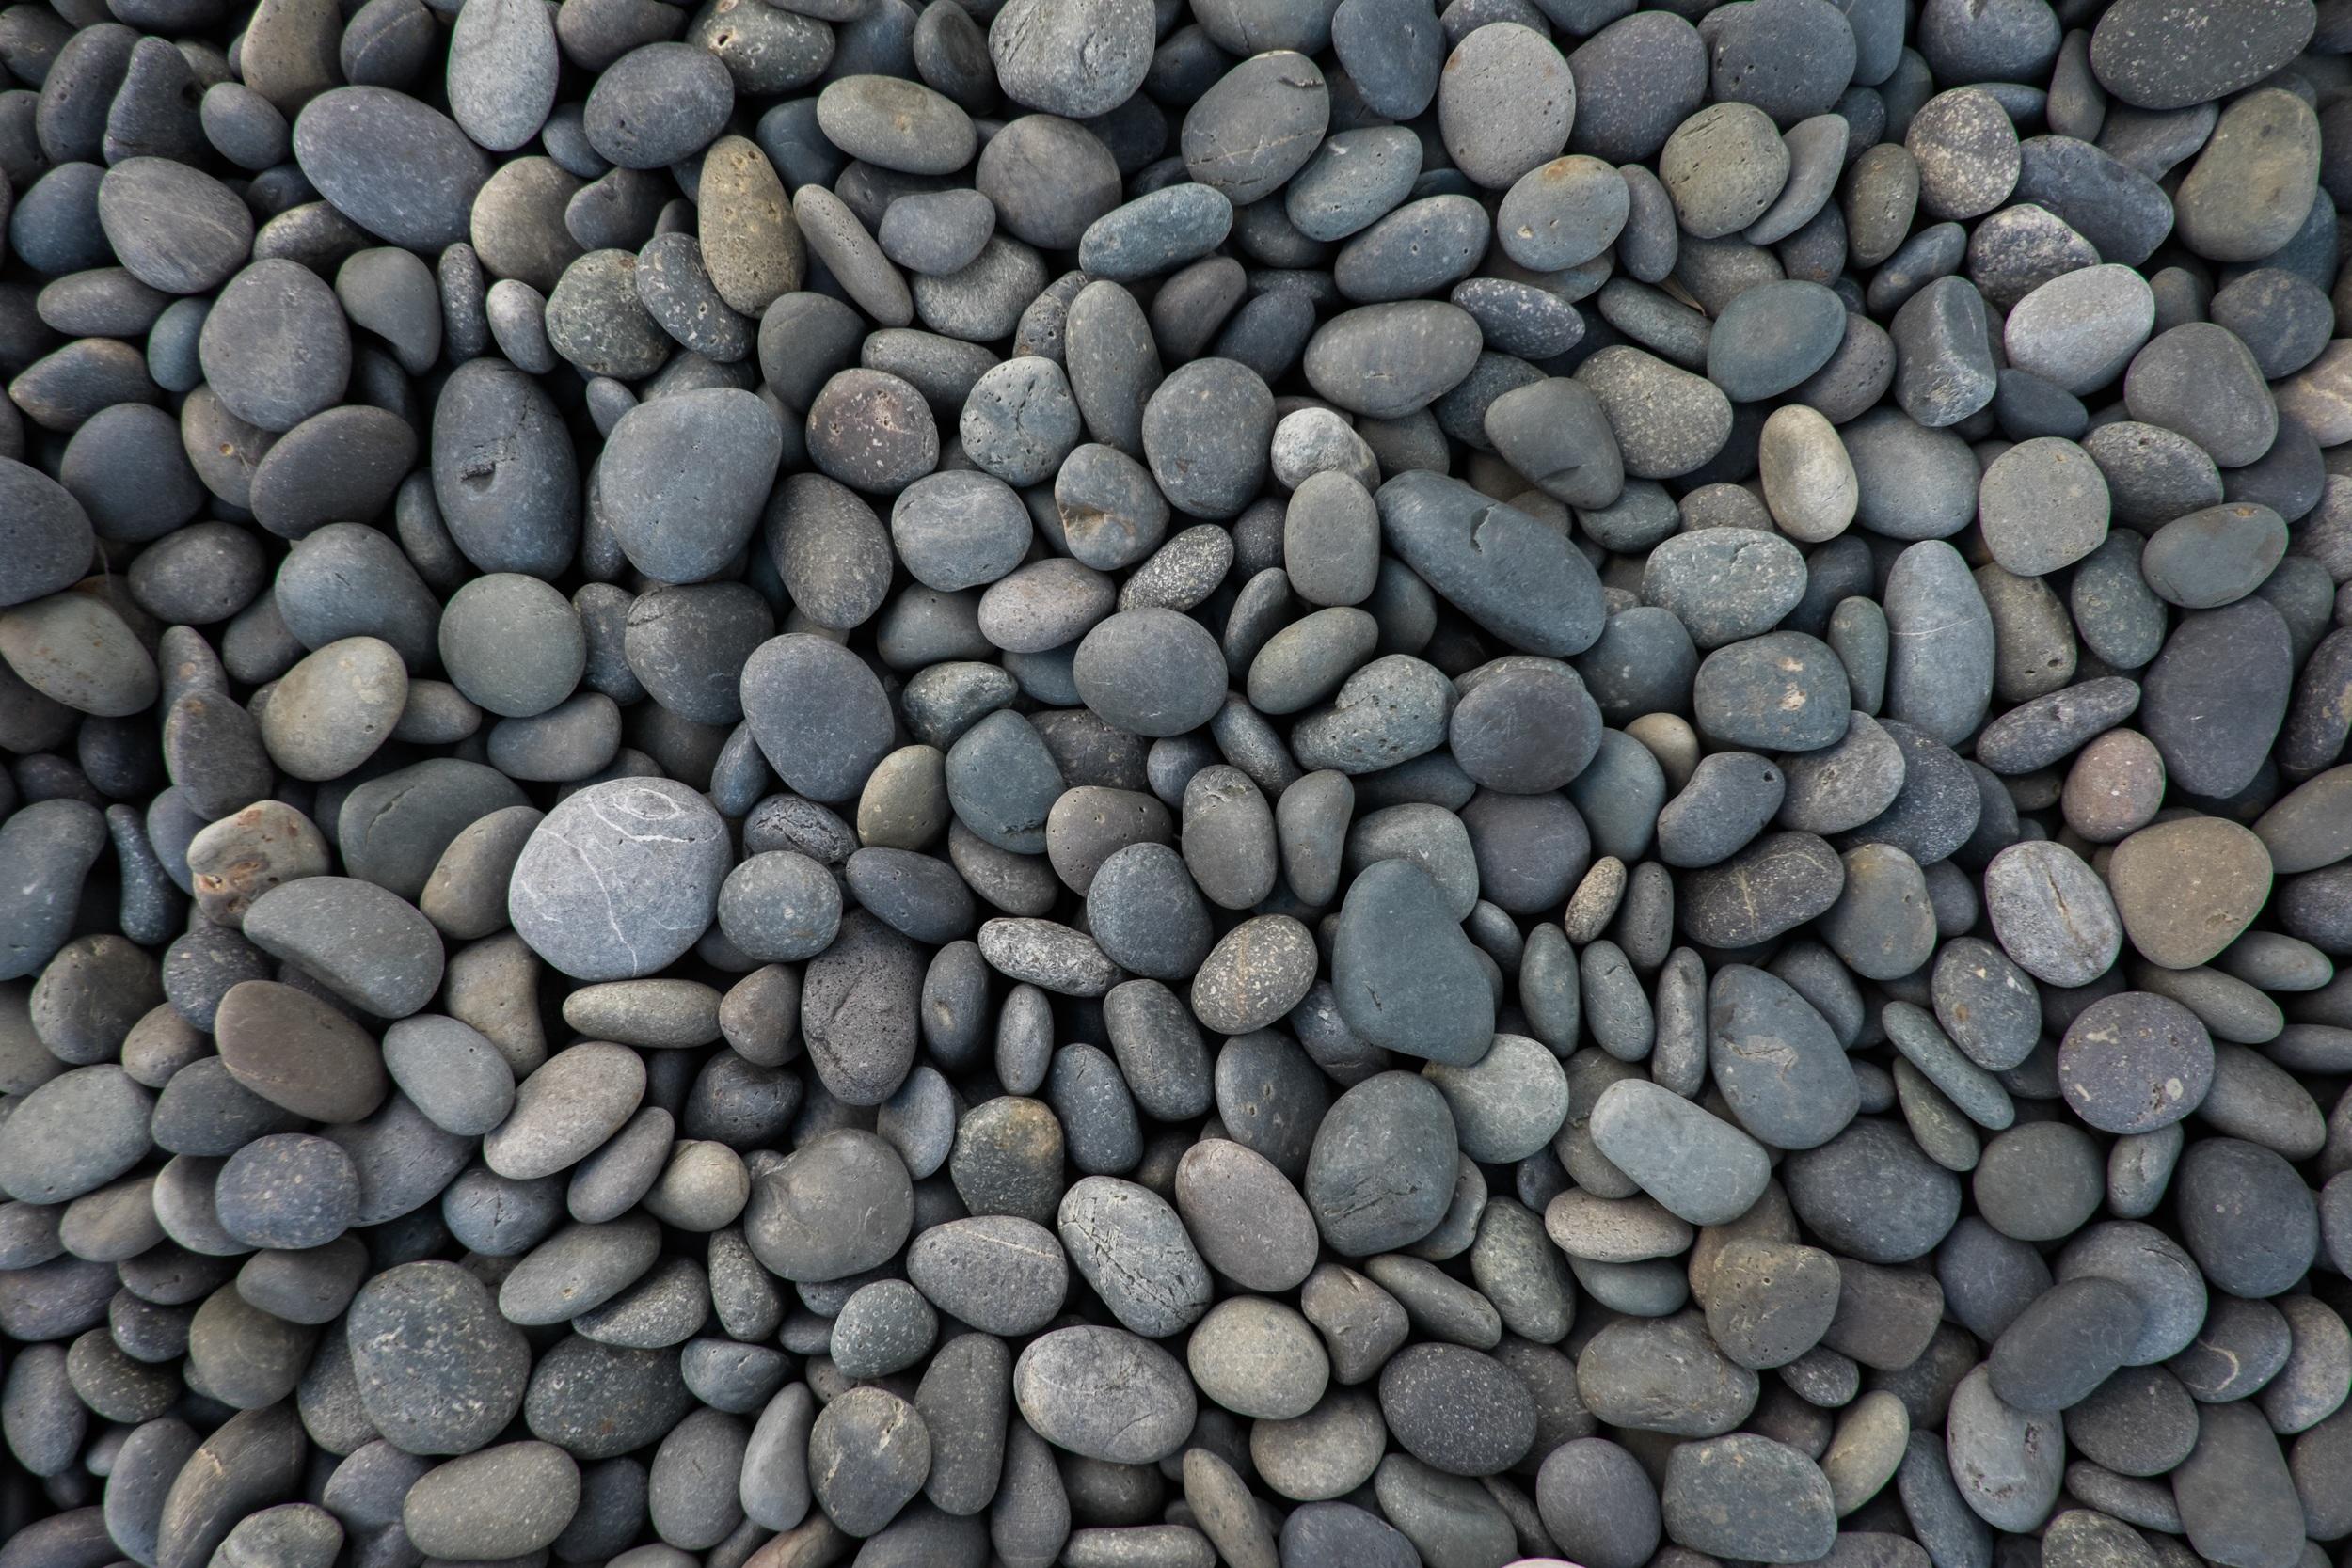 pebbles-1209189.jpg